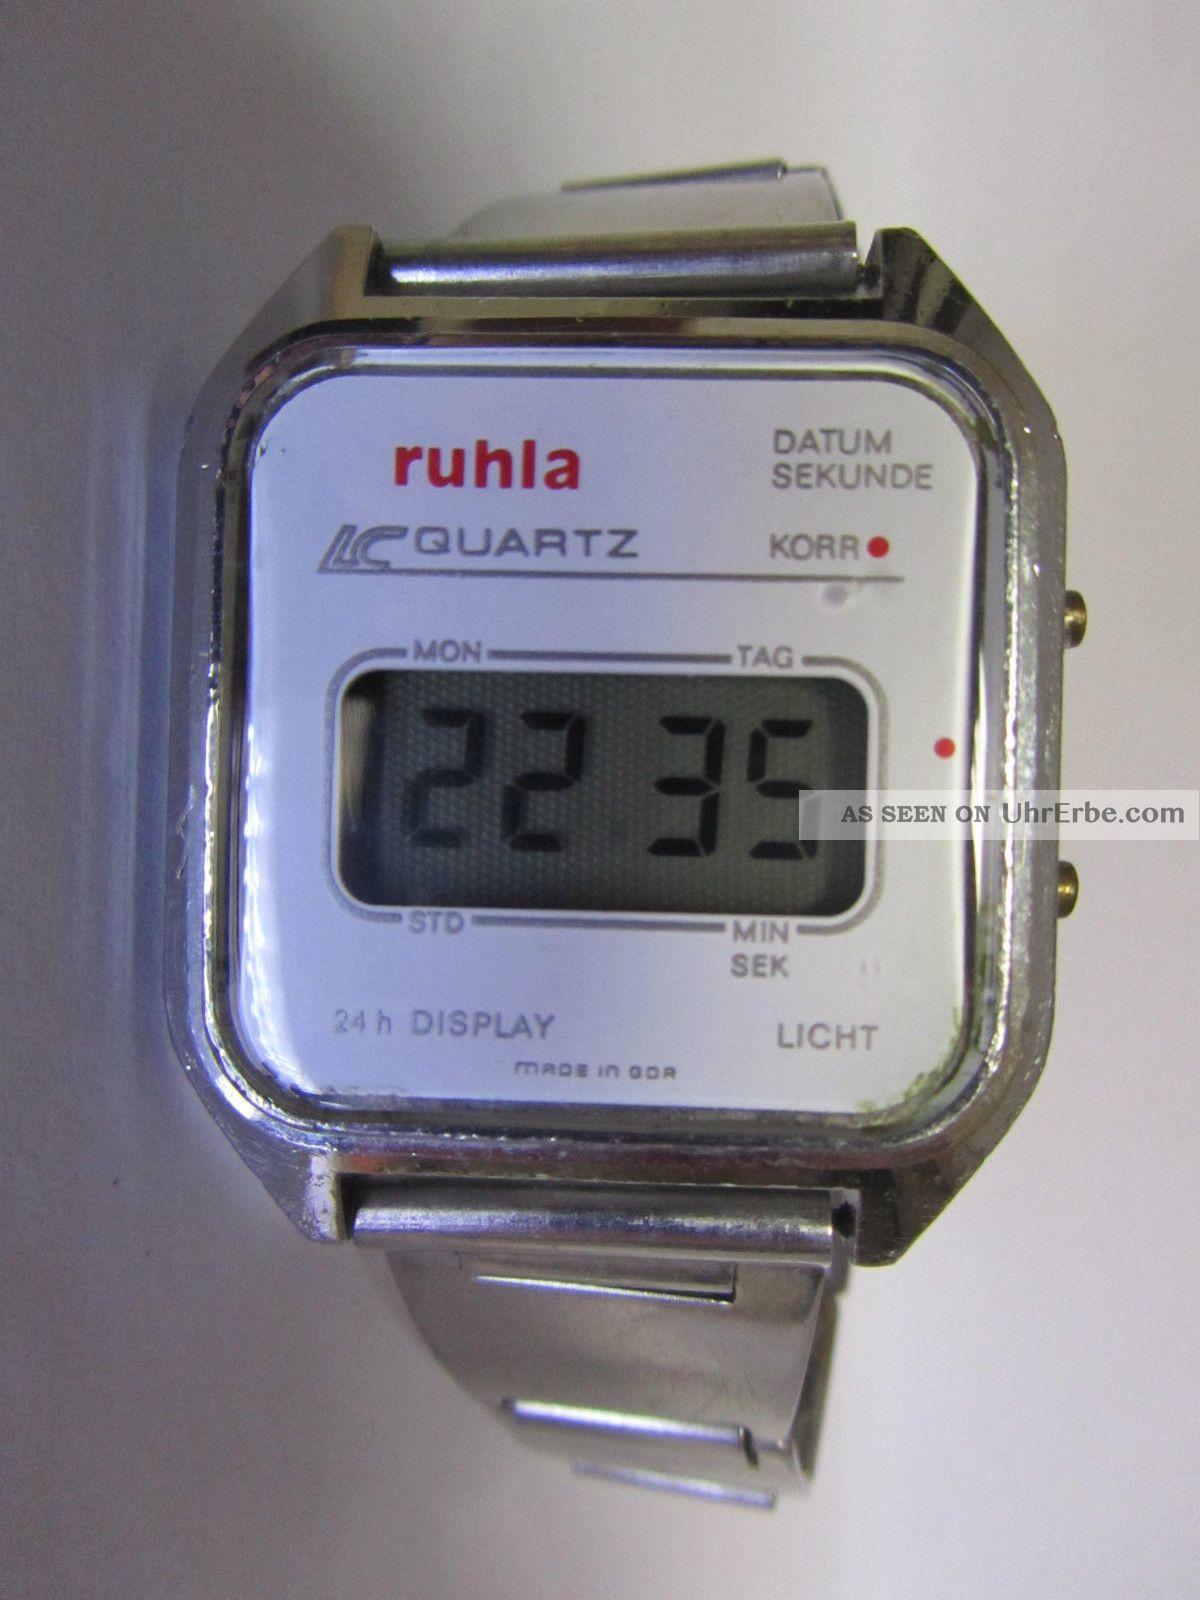 Ruhla Lcd Digital Ddr Quartz Uhr Mit Alu Band Seltenes Modell 16 - 01 _2 Armbanduhren Bild